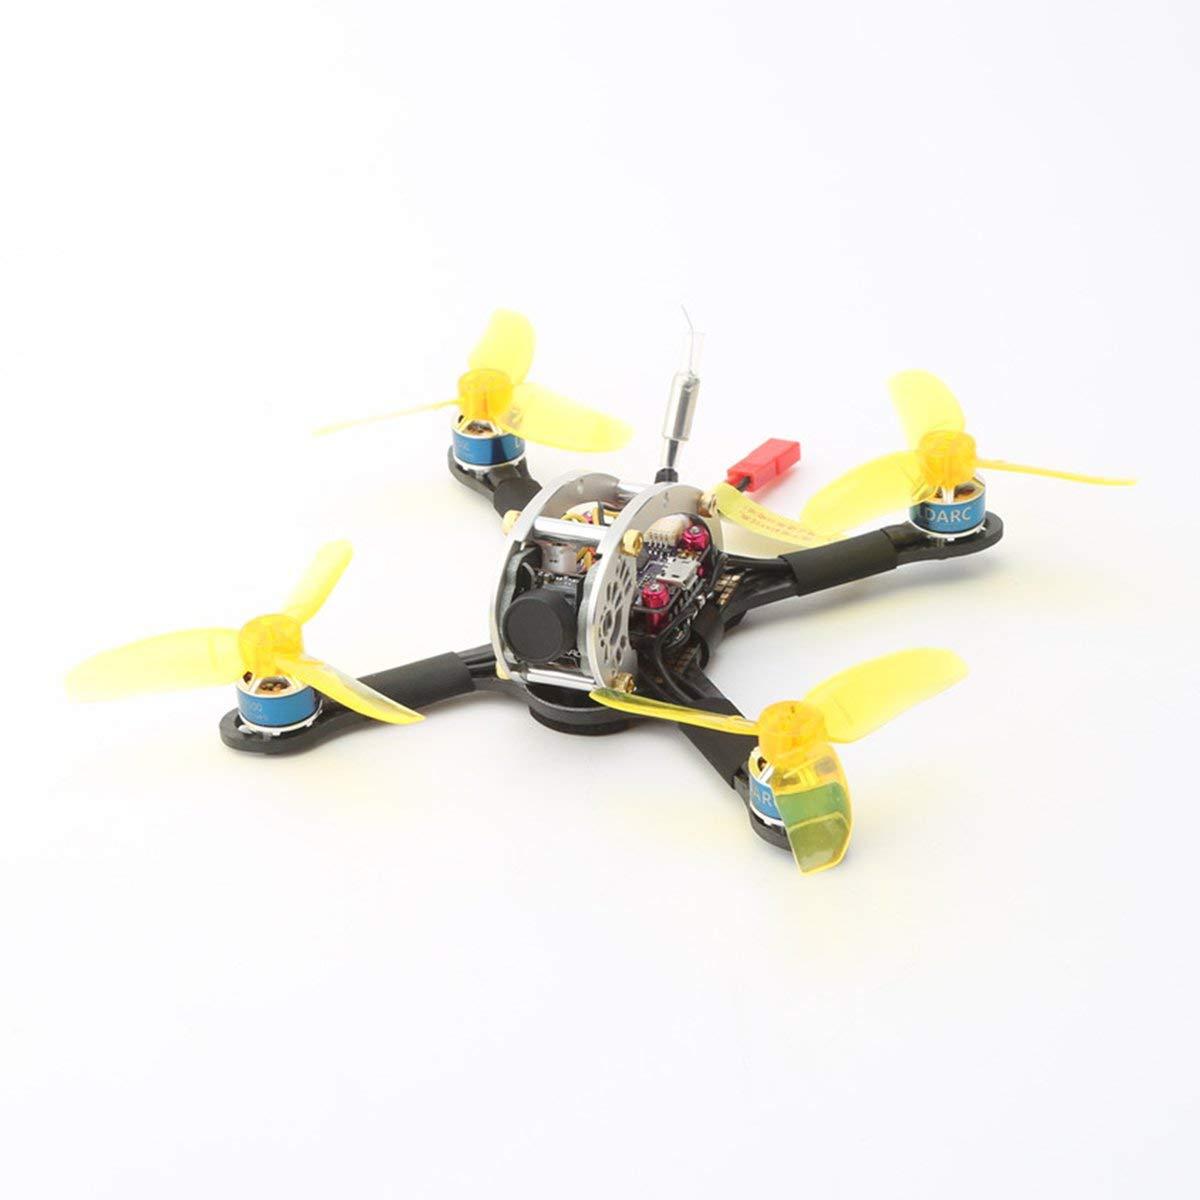 Gugutogo Drohne mit Kamera LDARC Flyegg V2 V2 V2 5.8G Brushless OSD-Kamera DSM2 RX Mini FPV RC Racing Drohne PNP b4bc11